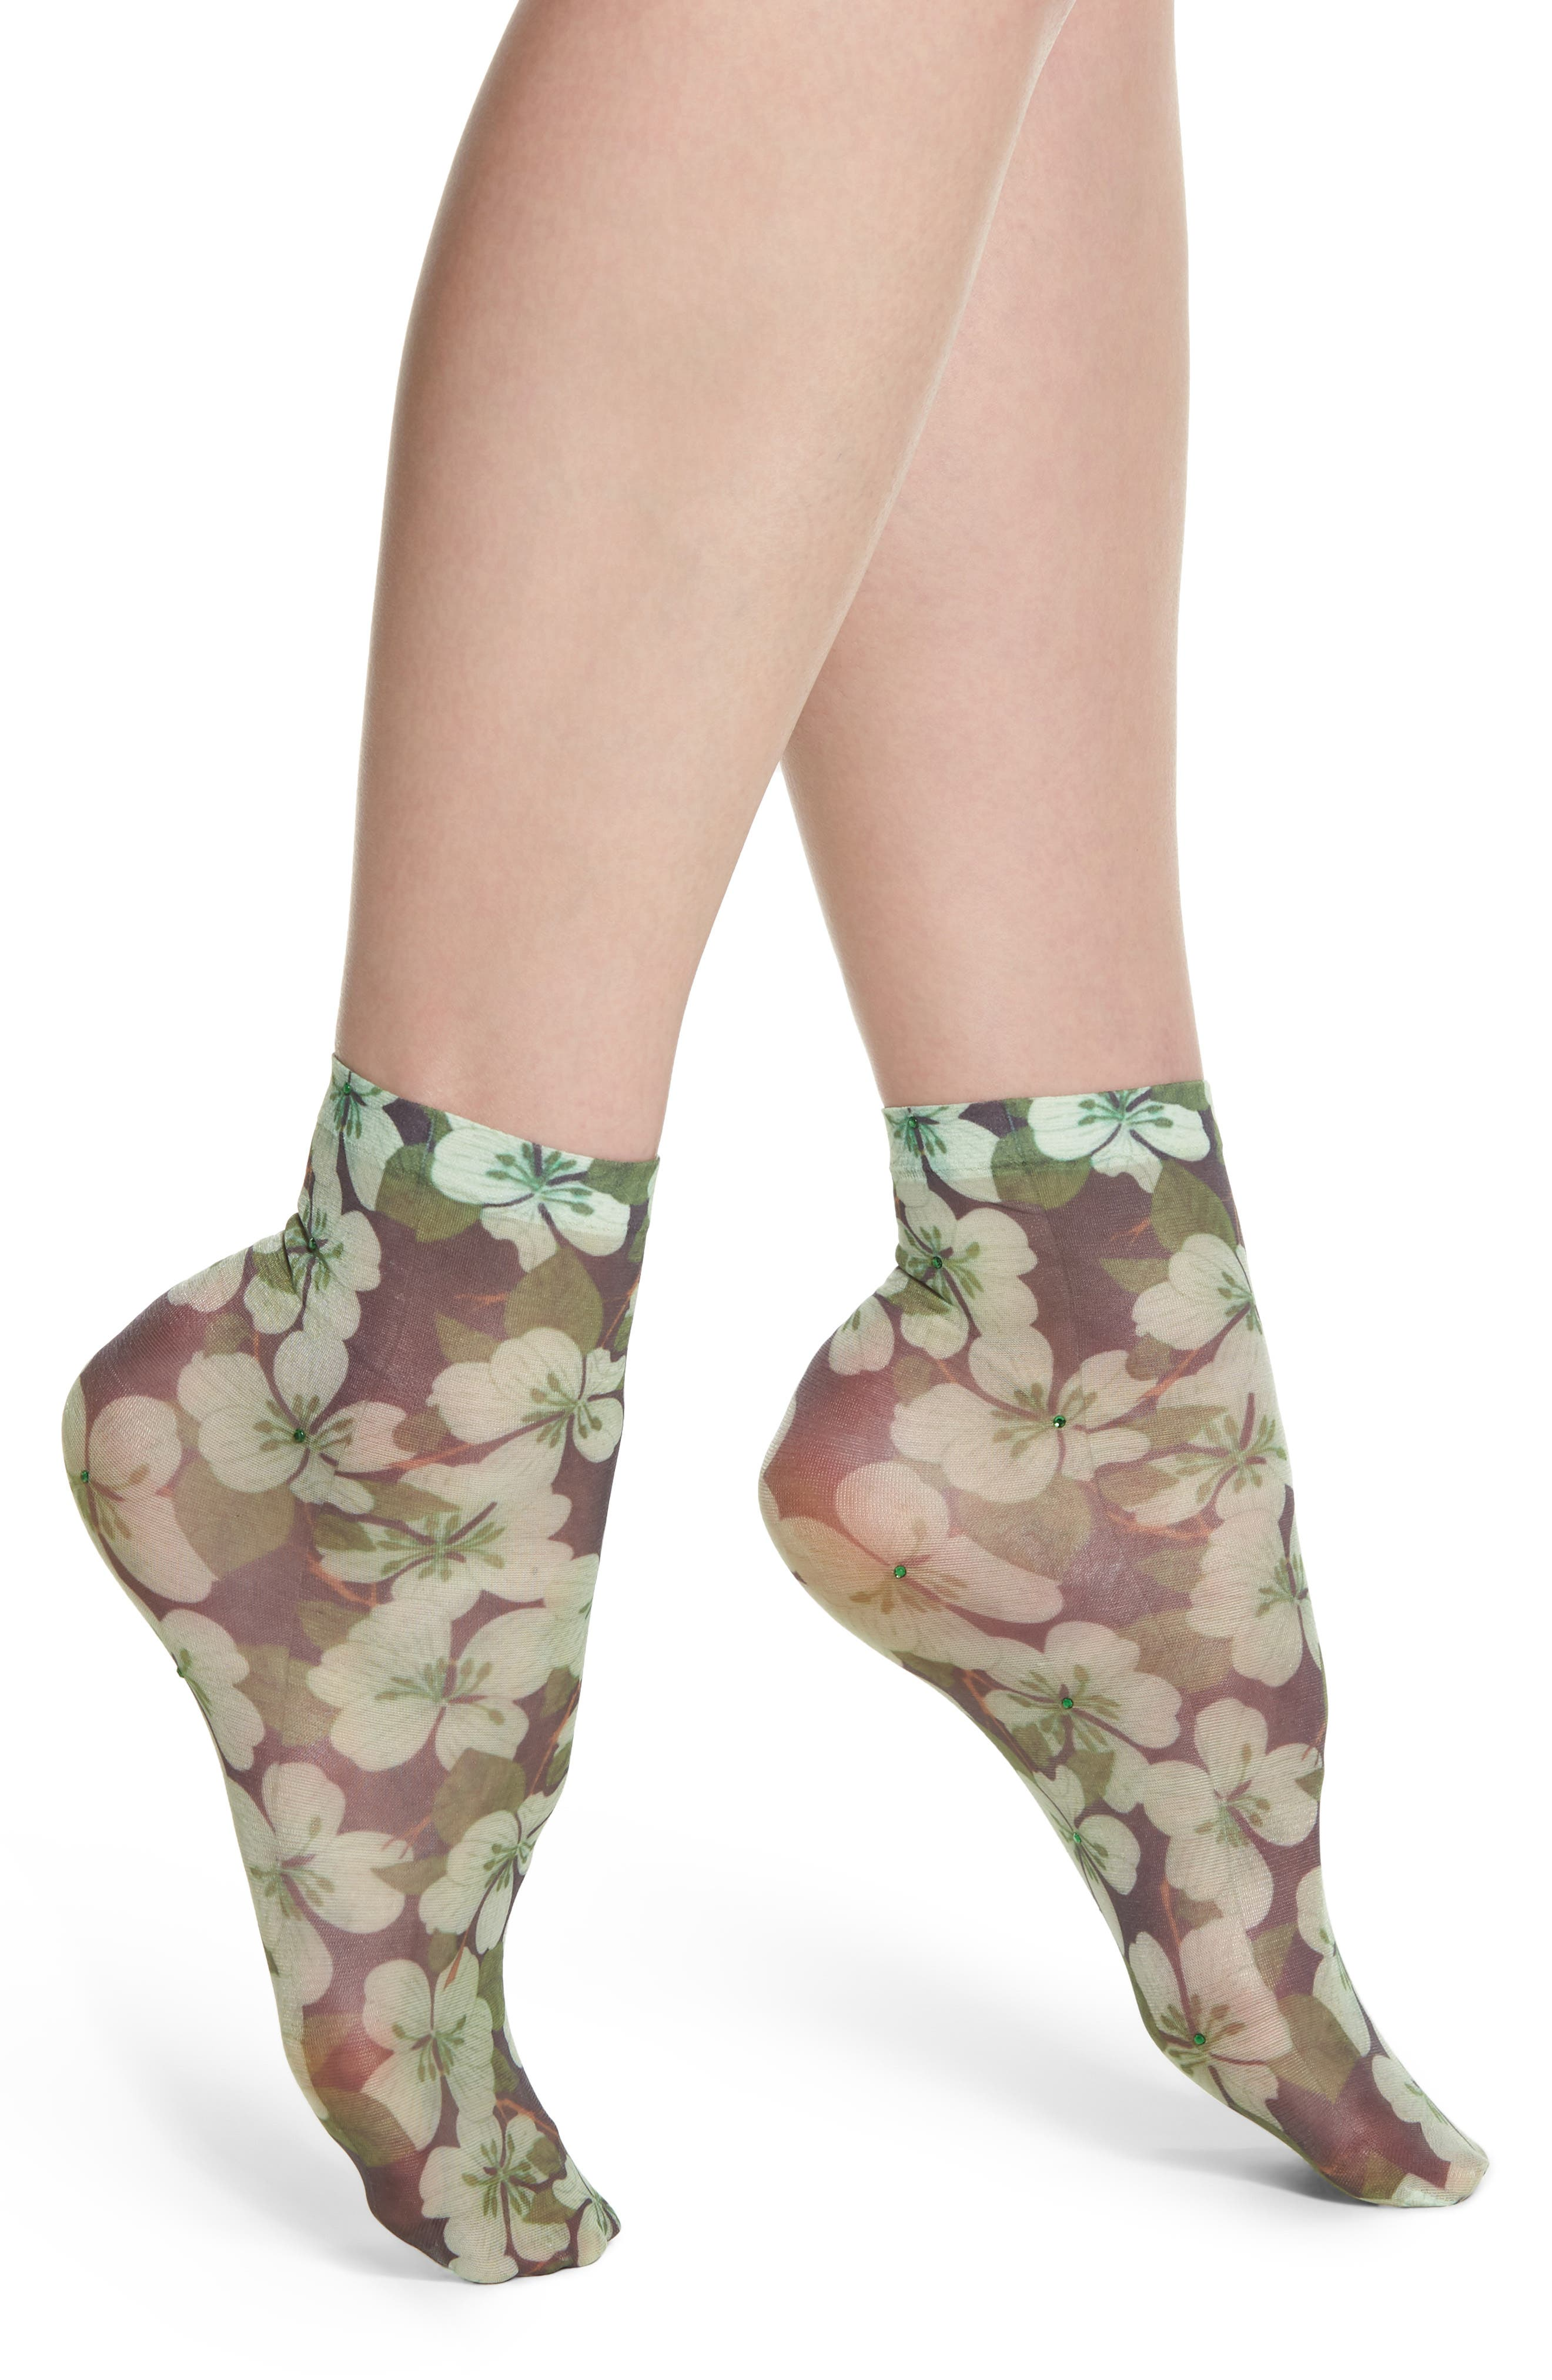 Annavittoria Ankle Socks,                             Main thumbnail 1, color,                             440